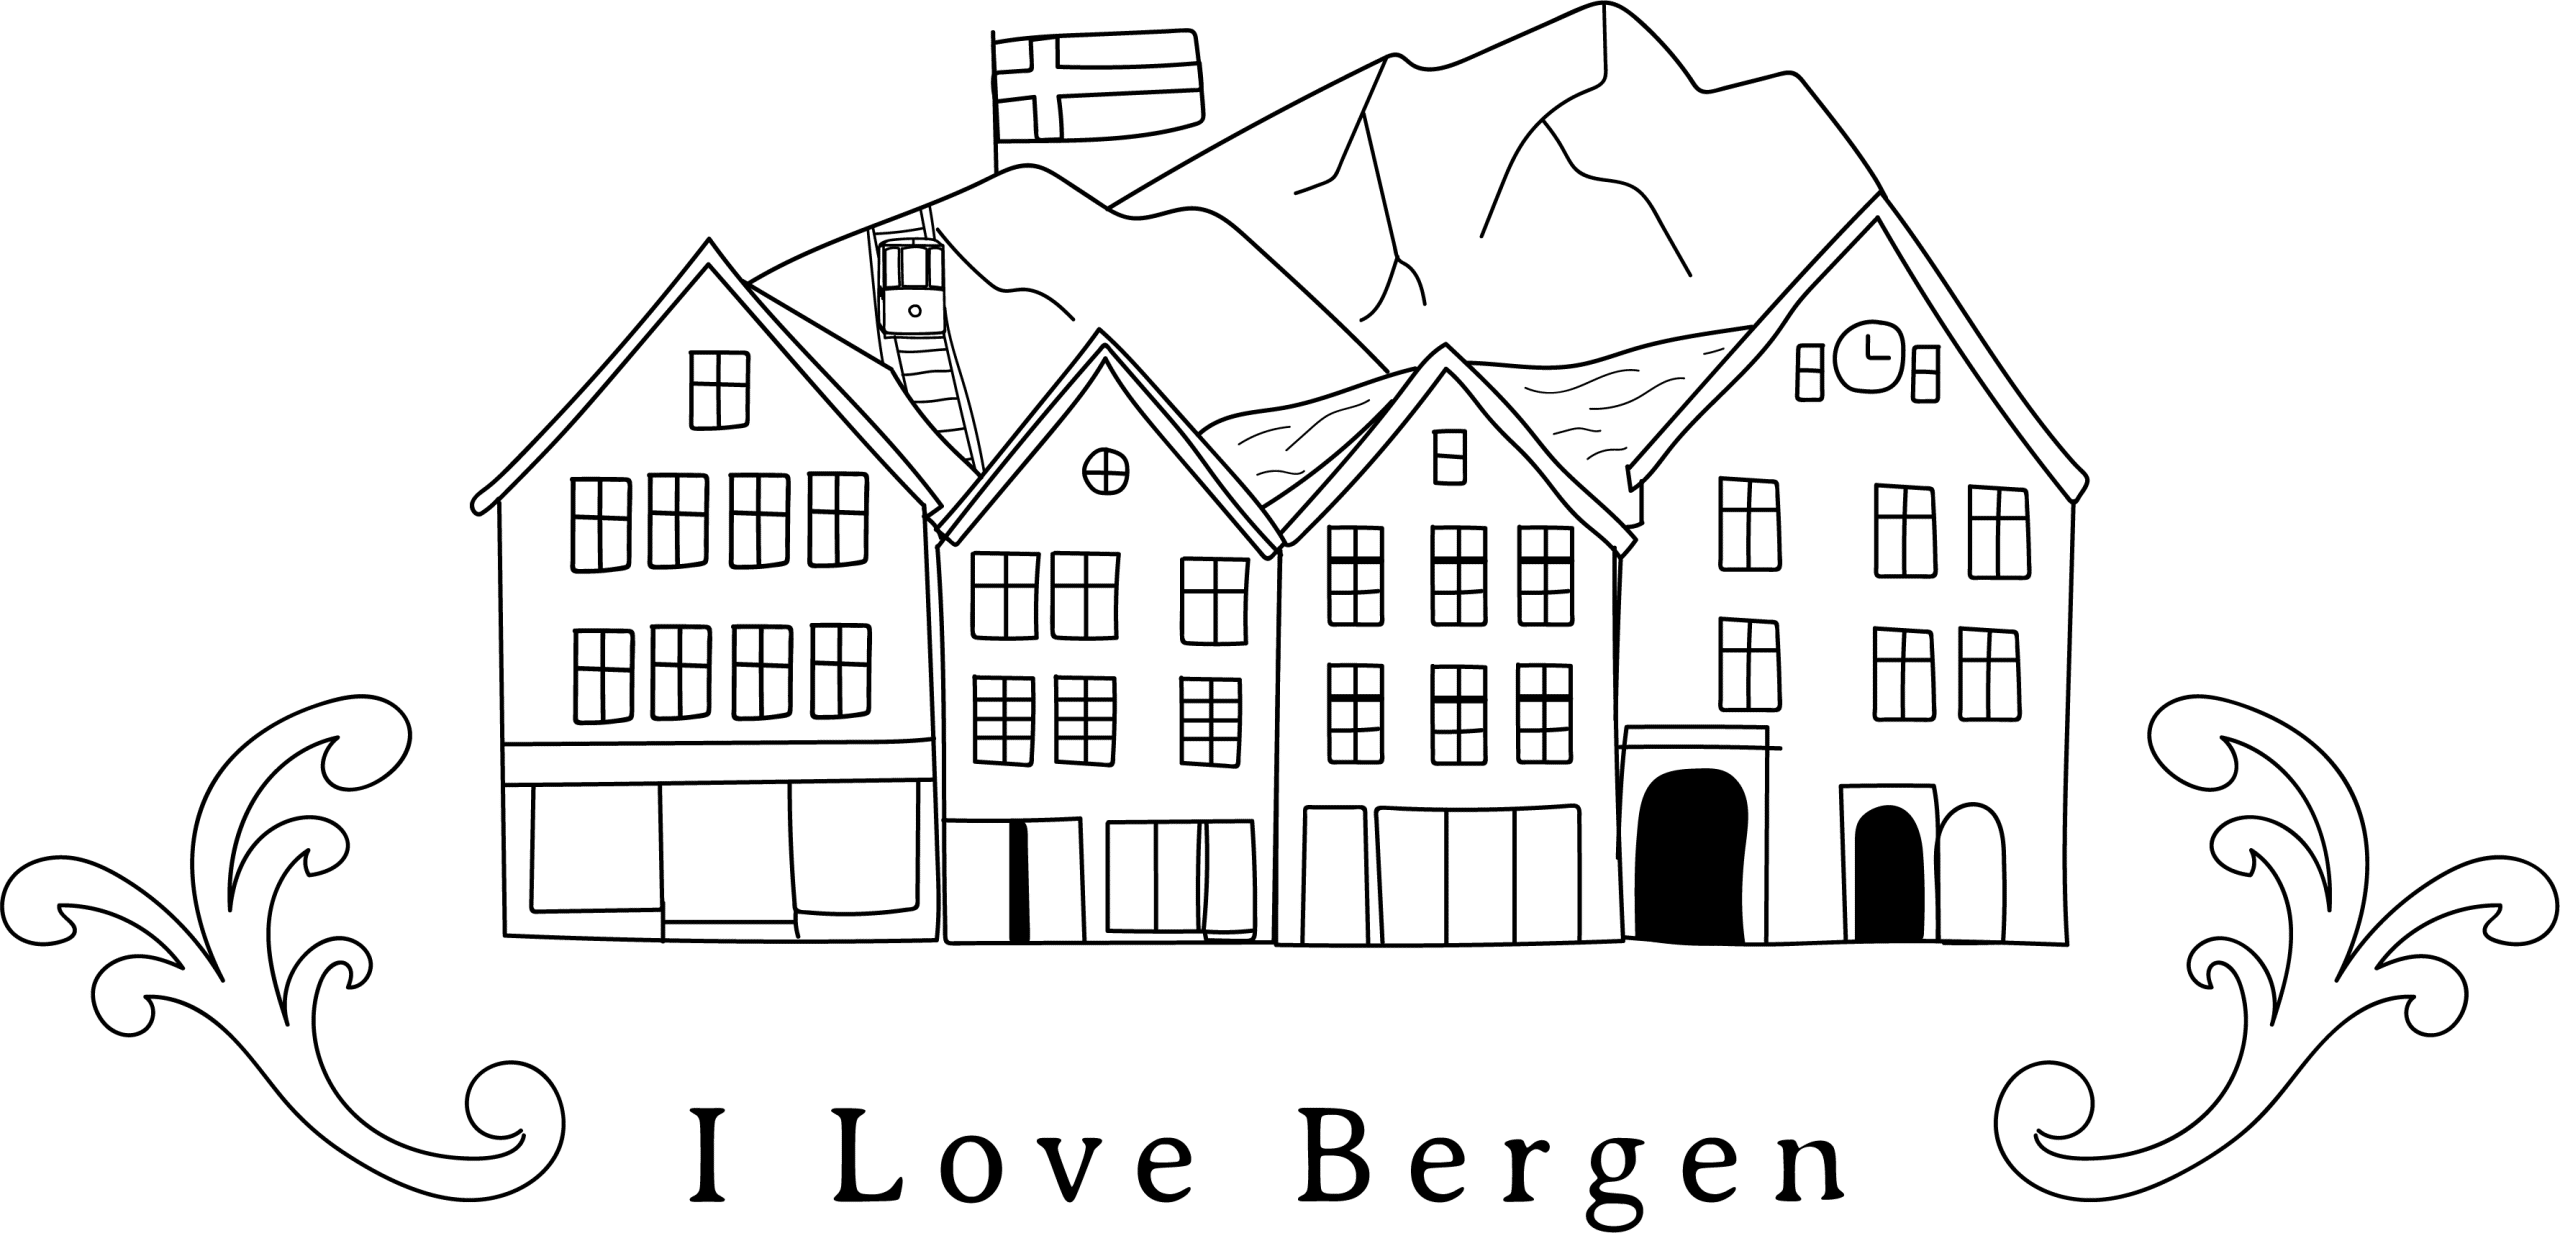 I Love Bergen